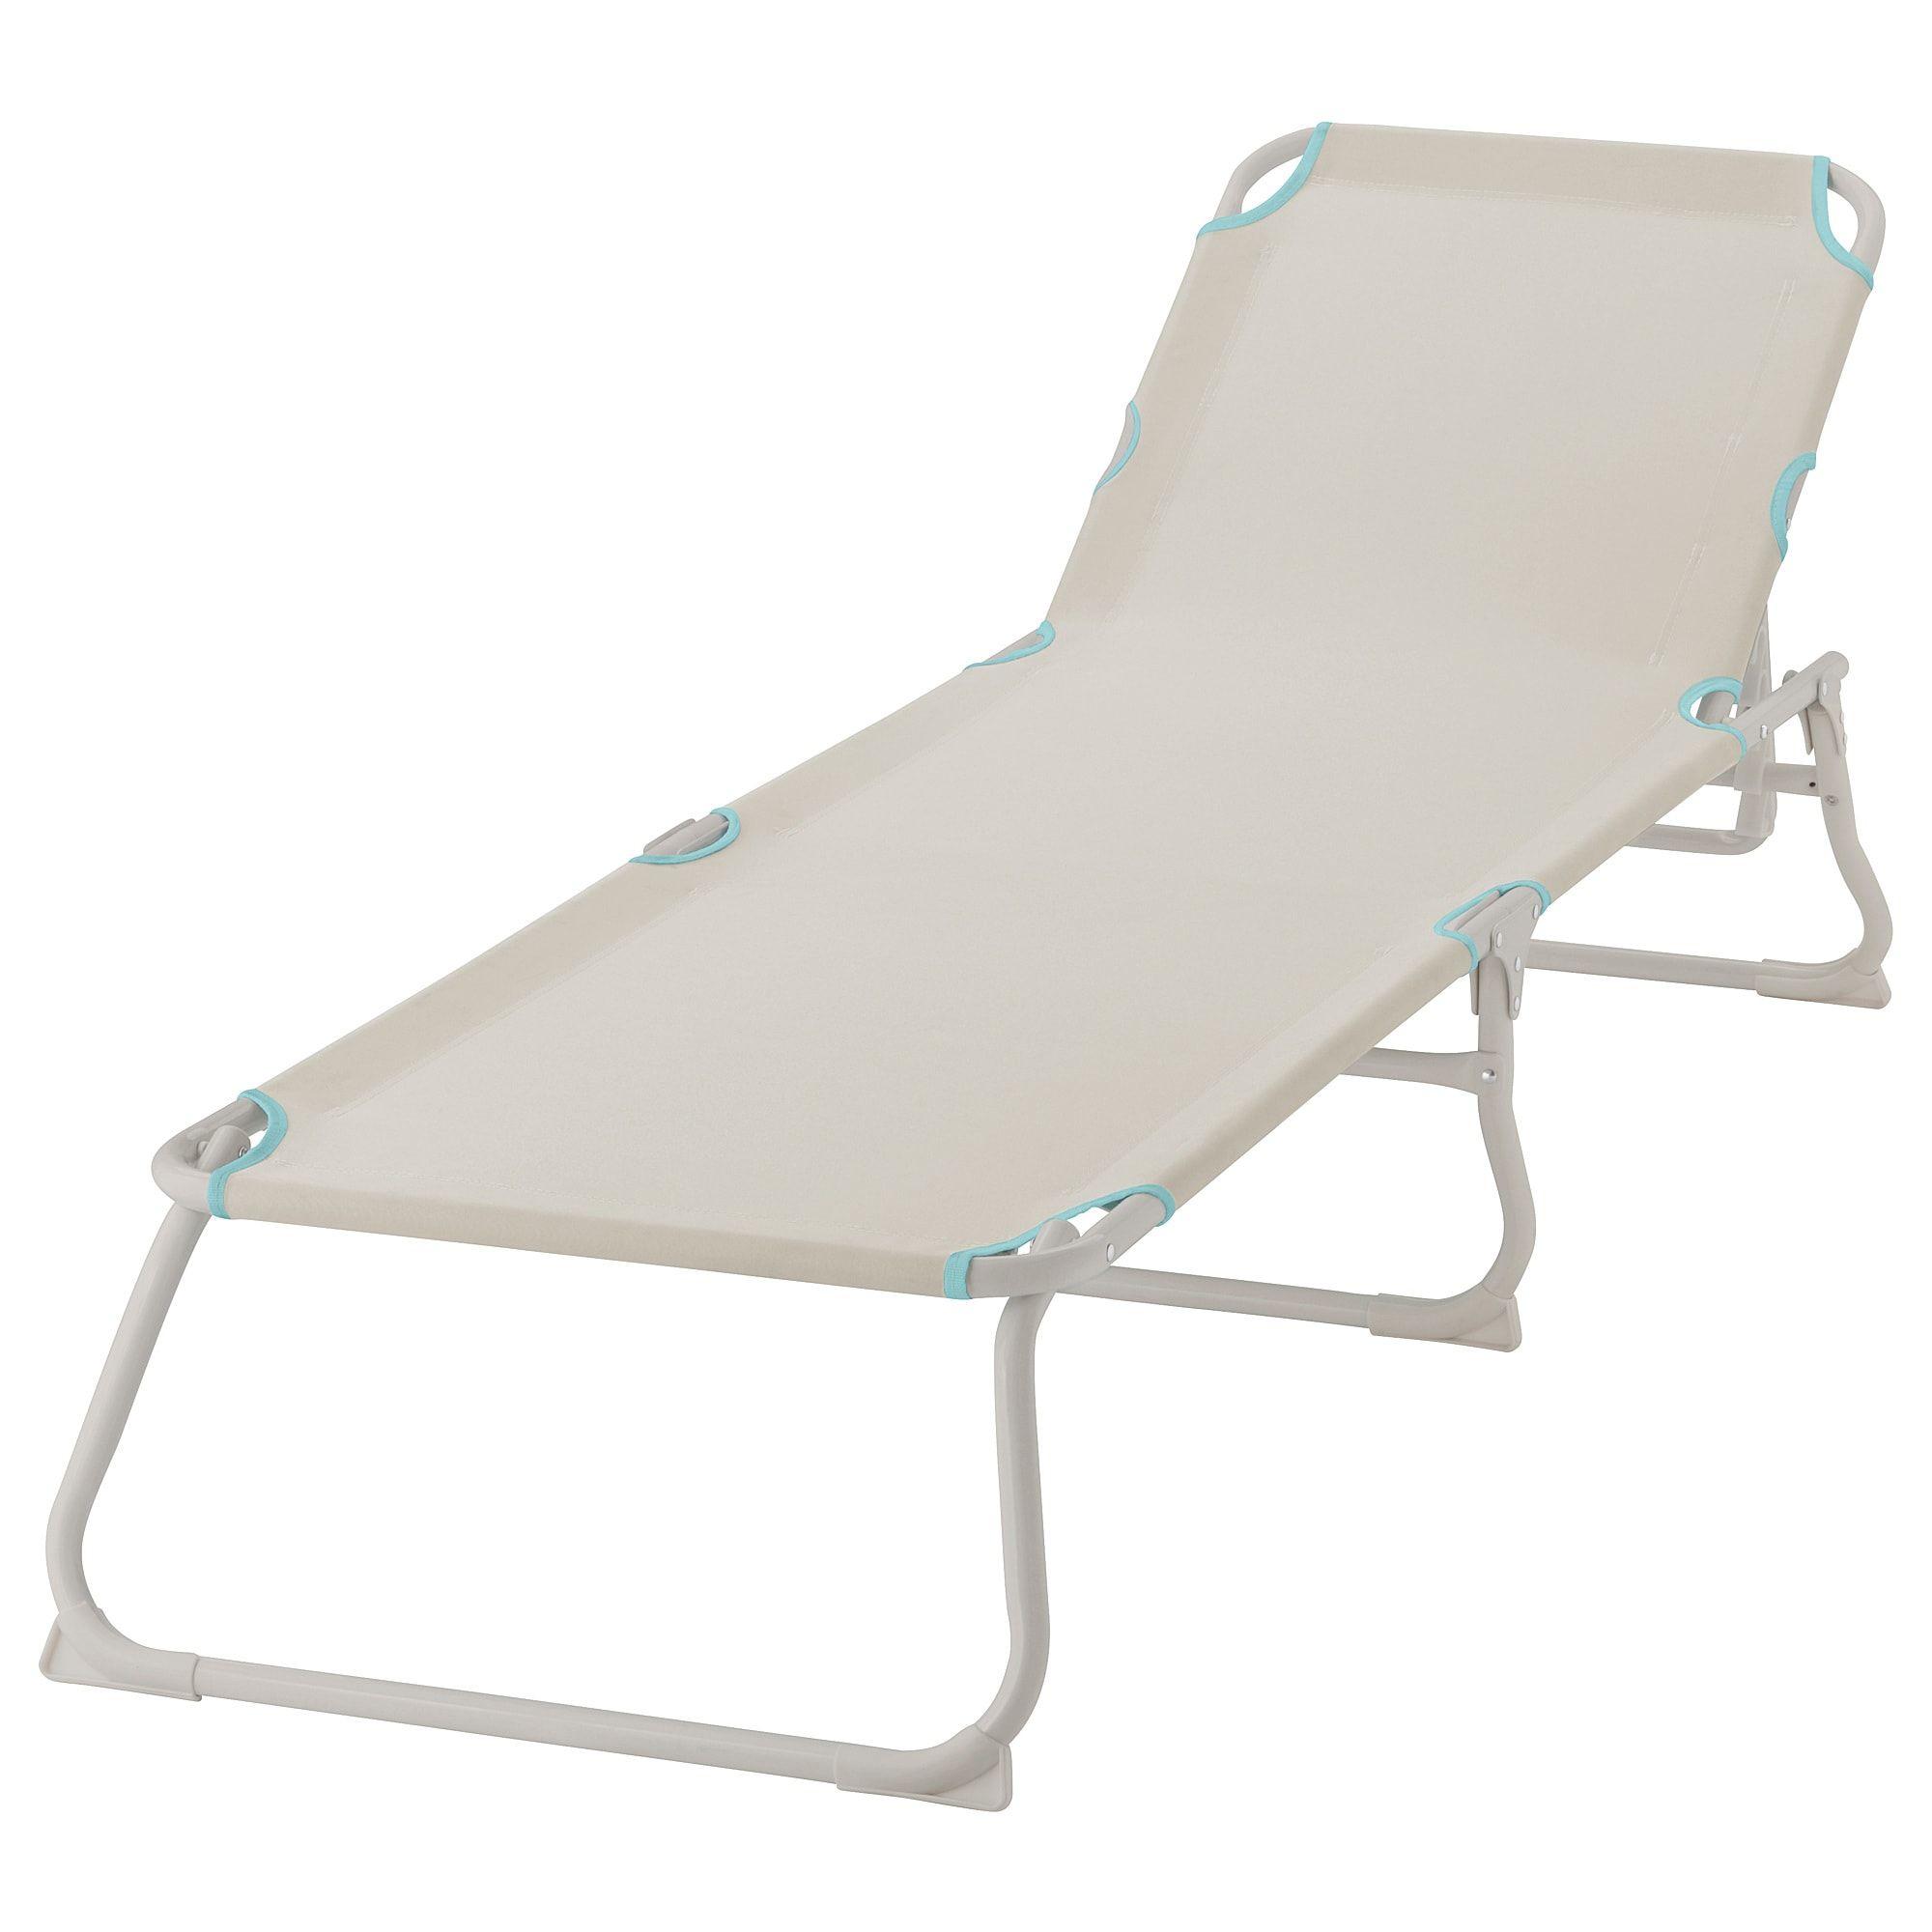 Håmö Chaise Lounger - Light Beige   Balancelle, Bain De ... destiné Transat Jardin - Ikea